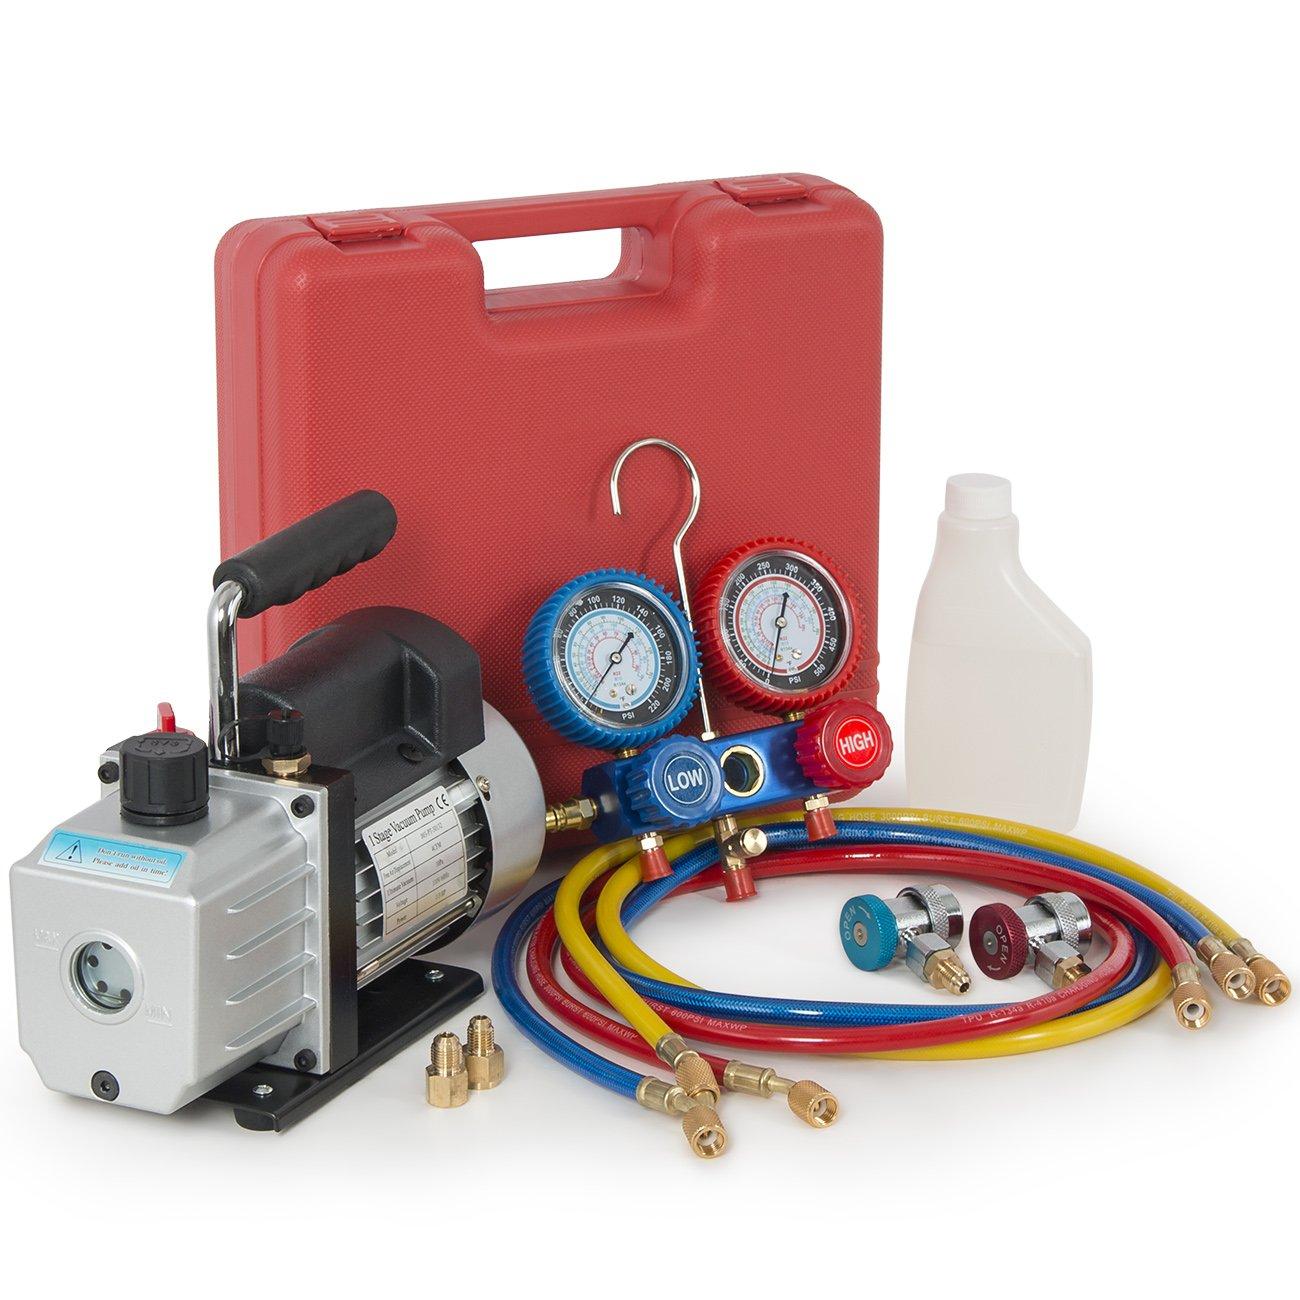 R134a Manifold + 4CFM Vacuum Pump